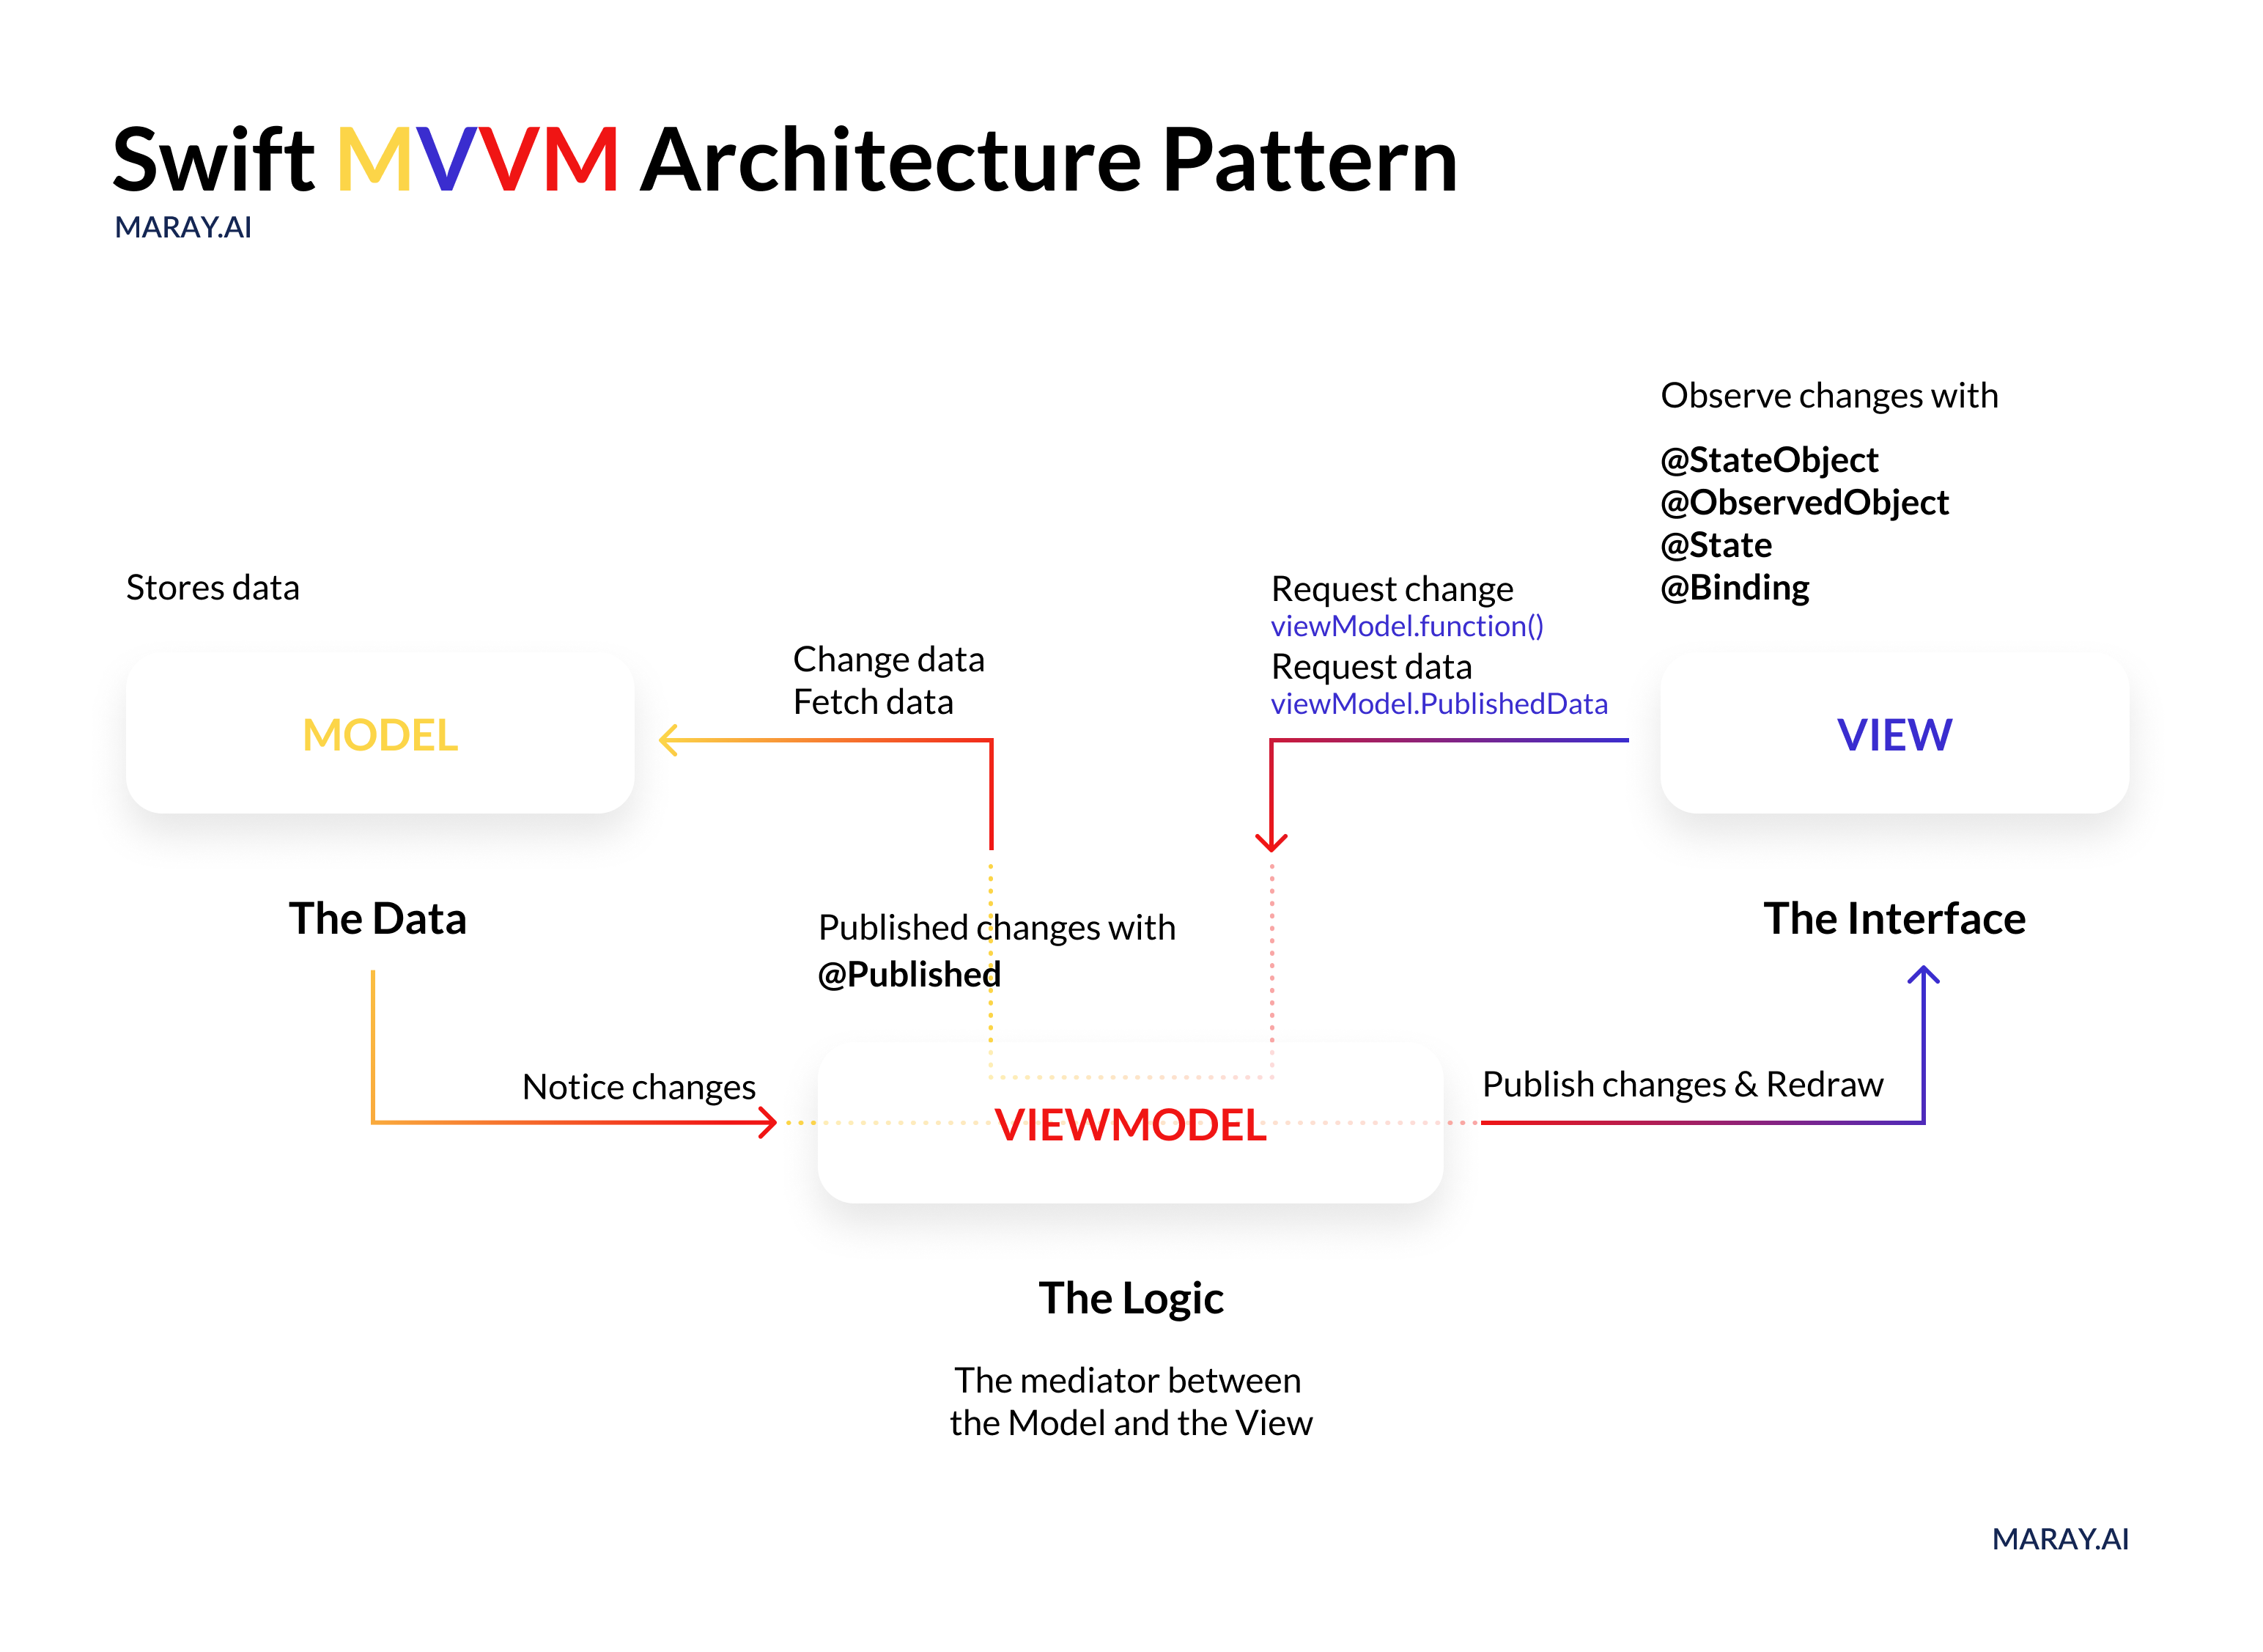 Swift MVVM Architecture diagram.